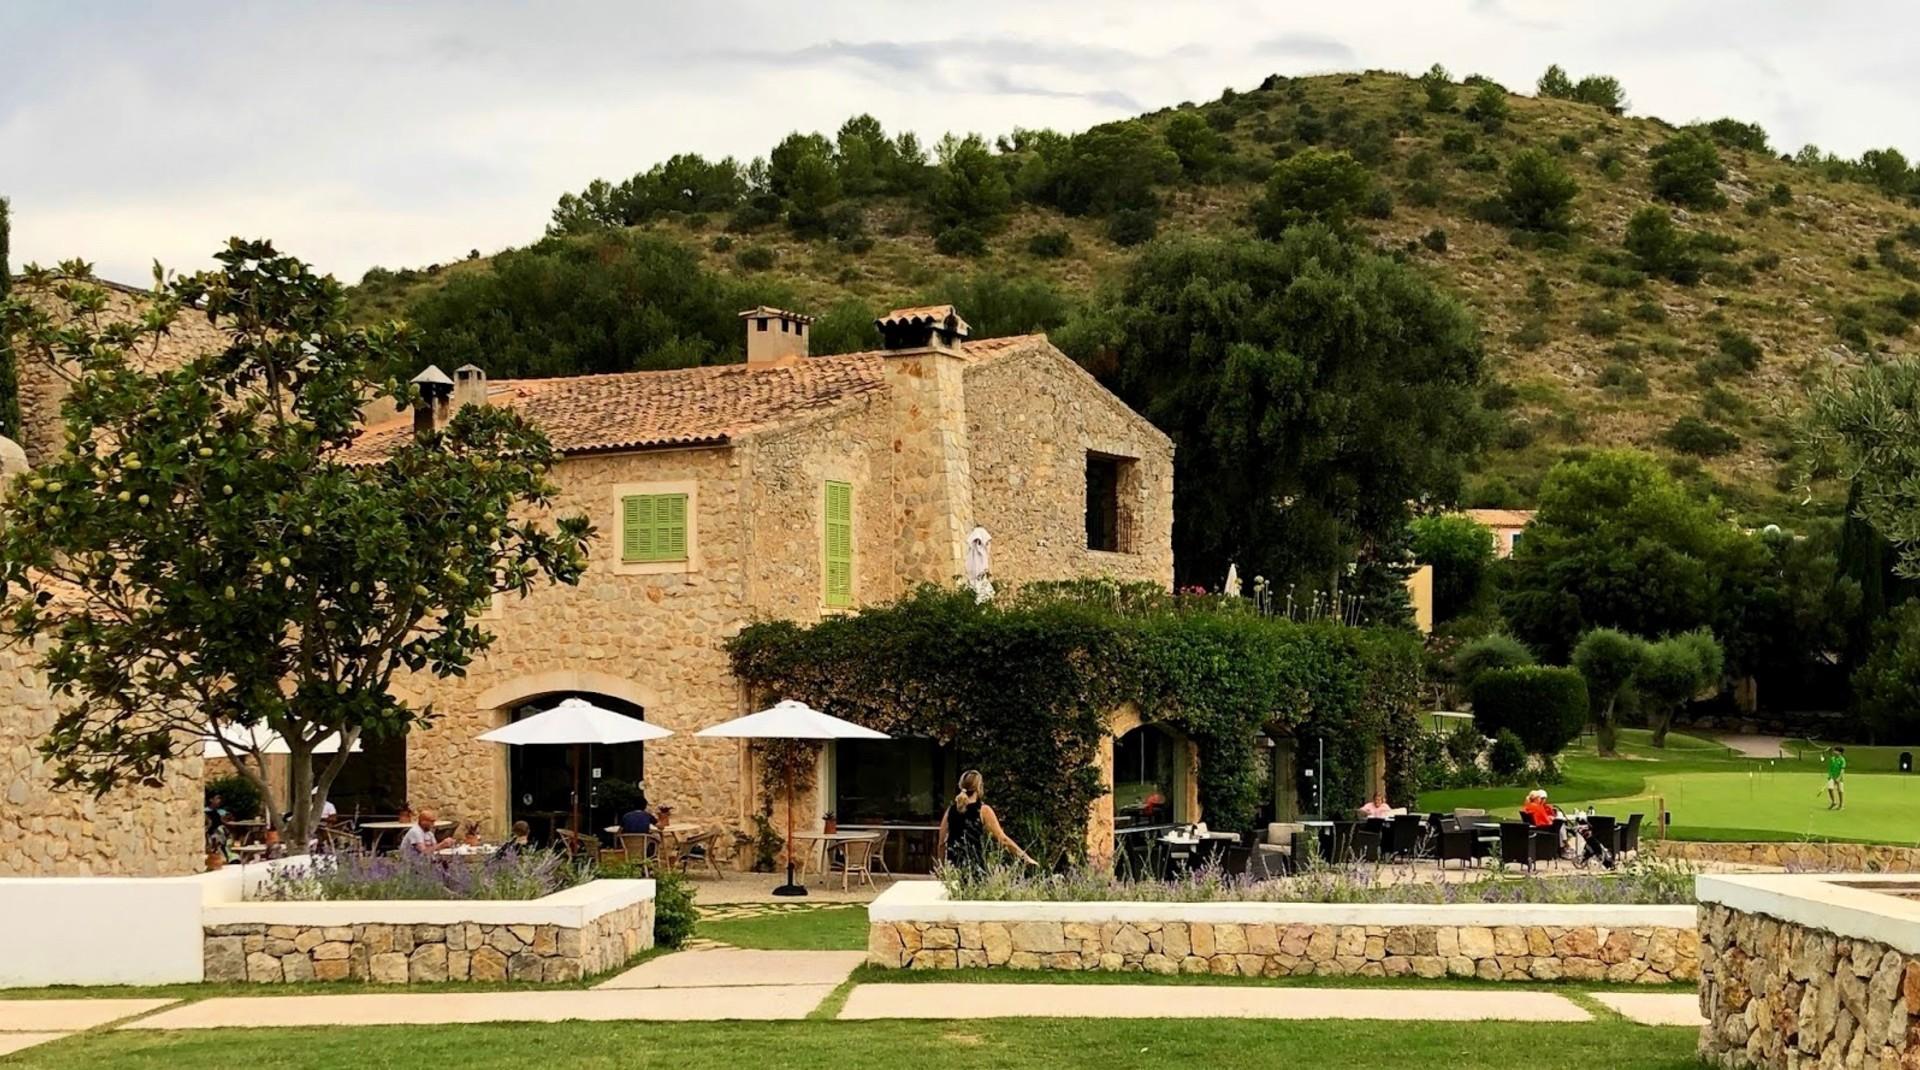 Golfreisebericht über Spanien, Mallorca - Fincahotel Cases de Pula